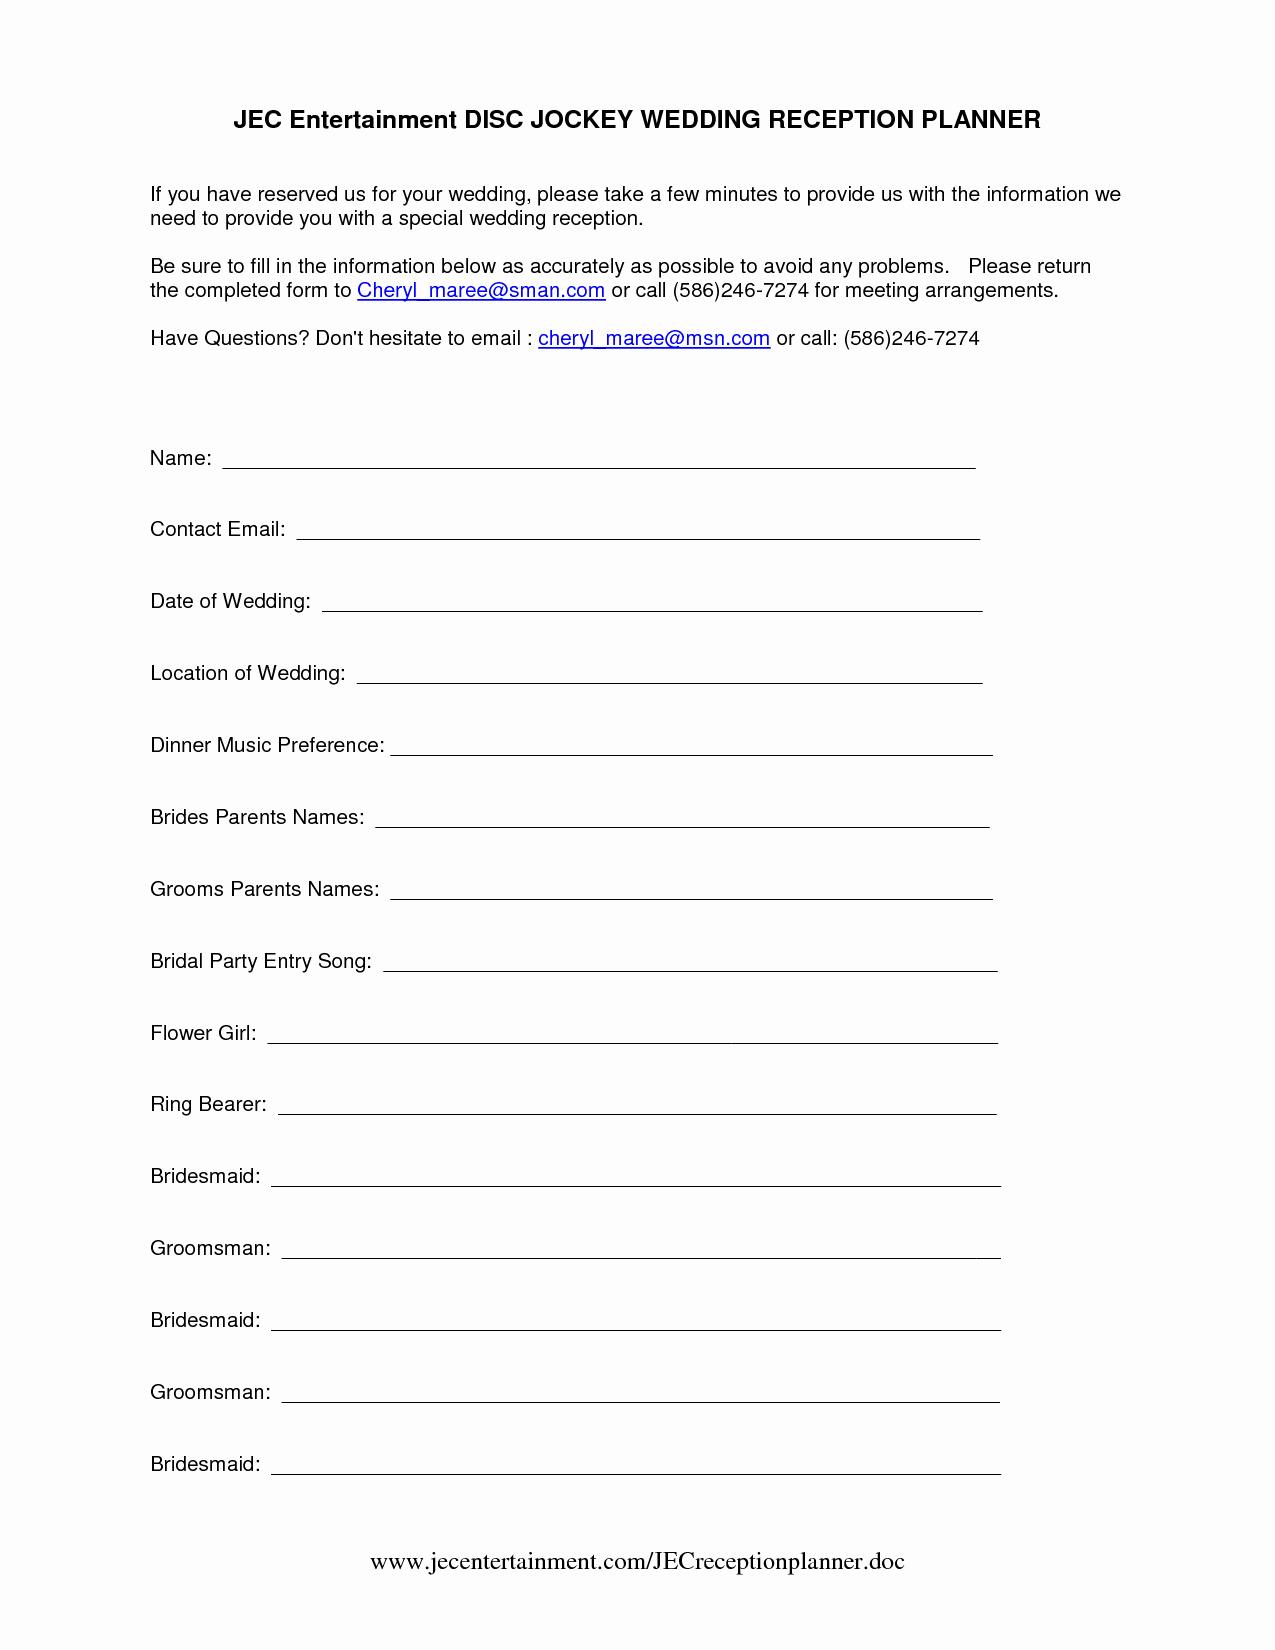 Wedding Dj Contract Template New Dj Wedding Planner form